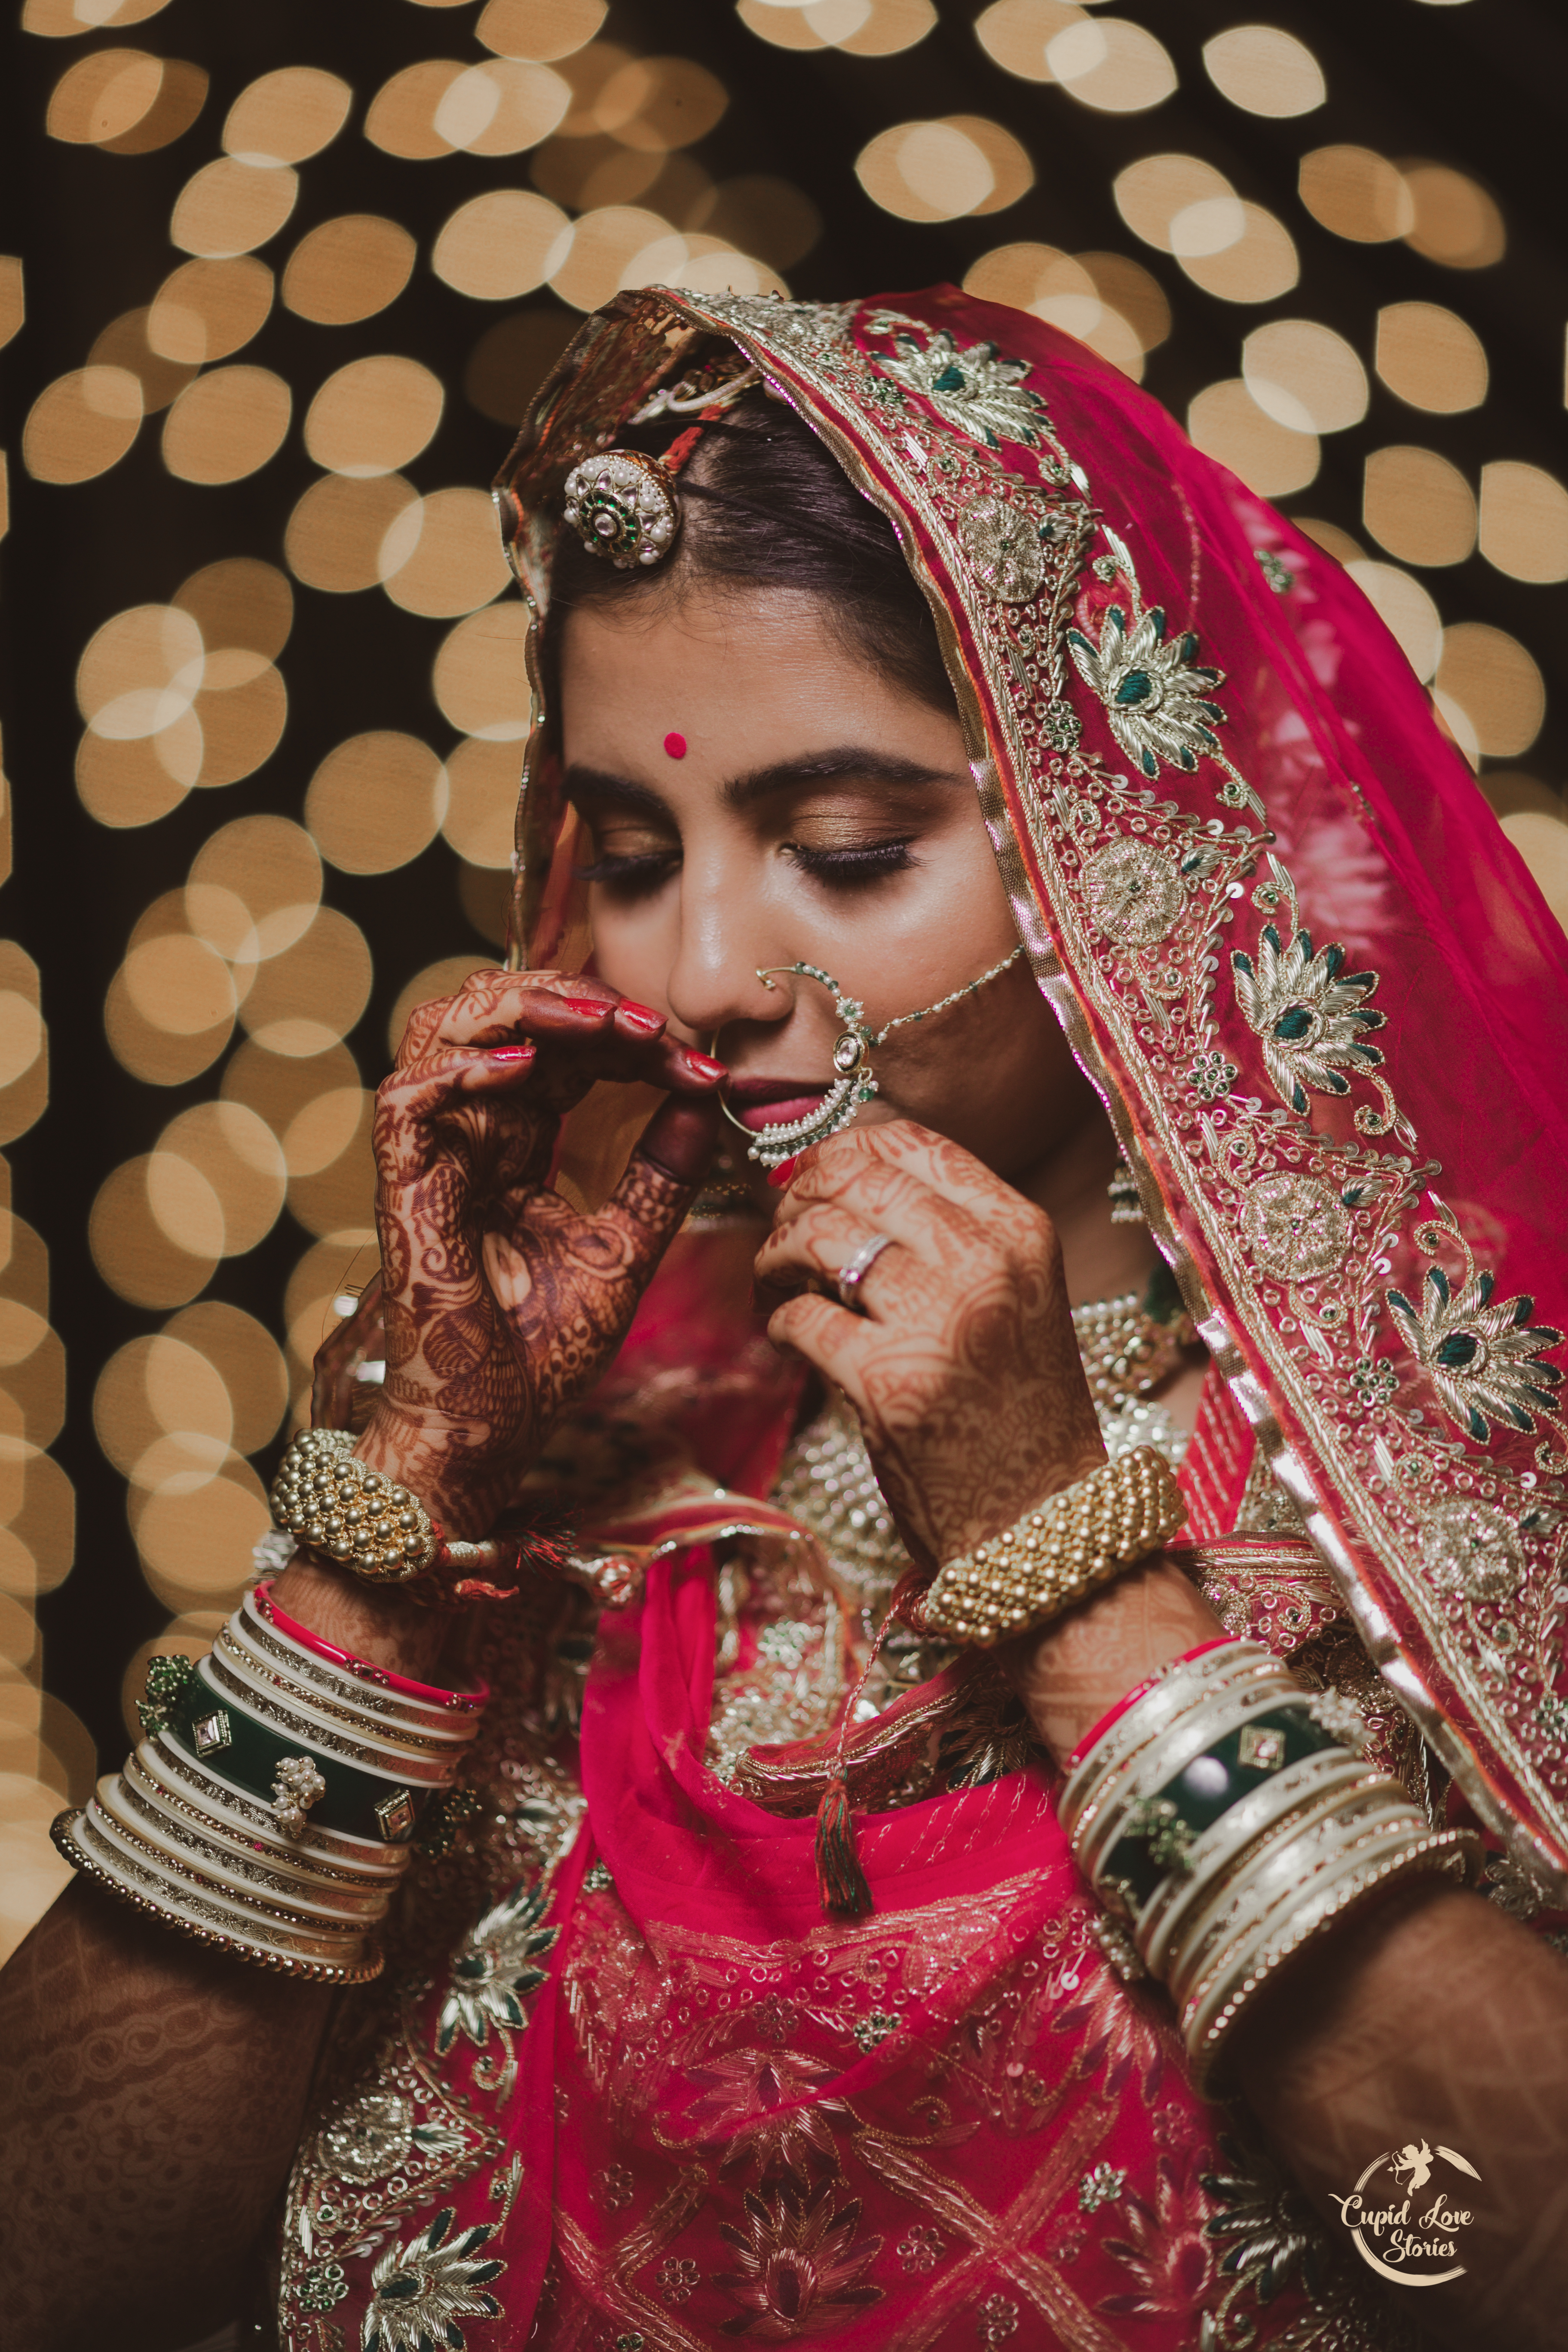 Aesthetic bridal portrait